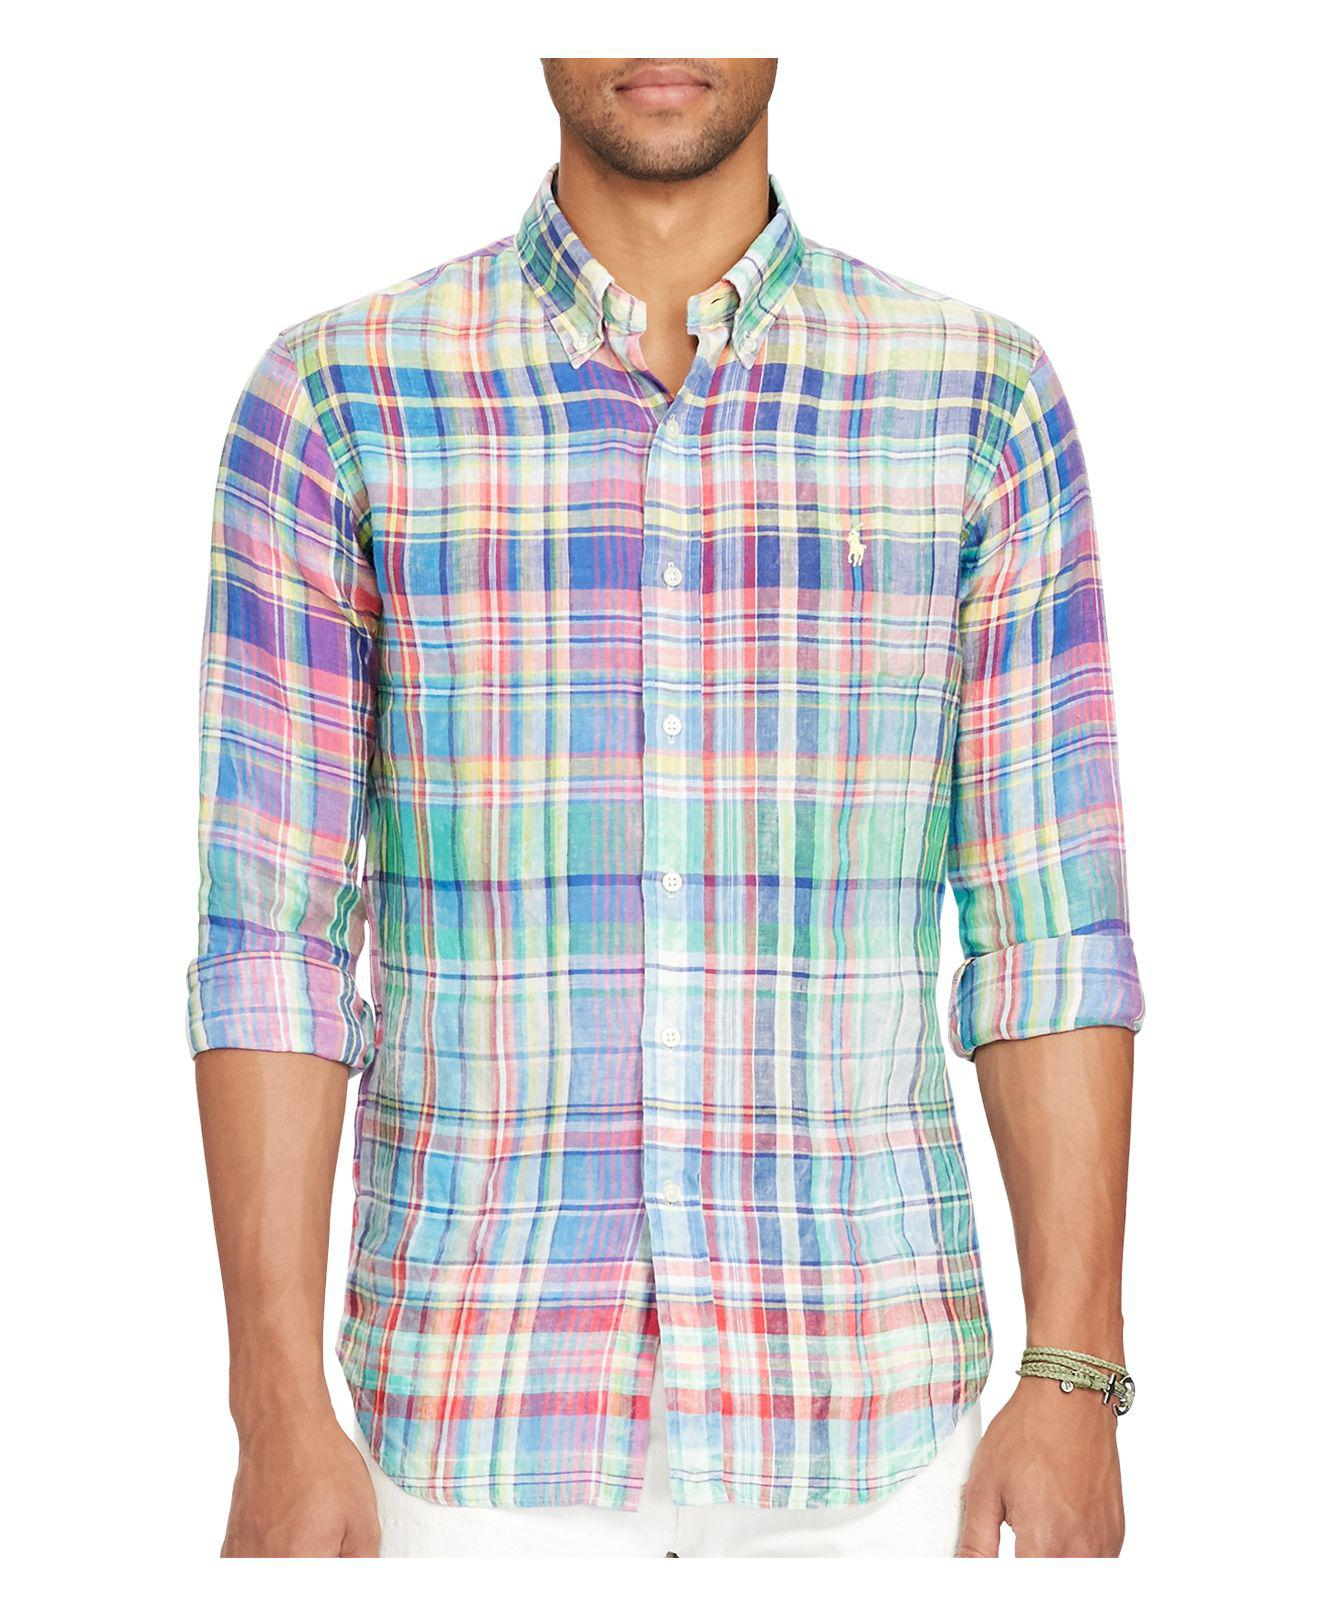 3a60f6717557 Lyst - Polo Ralph Lauren Ocean-wash Classic Fit Button-down Shirt in ...